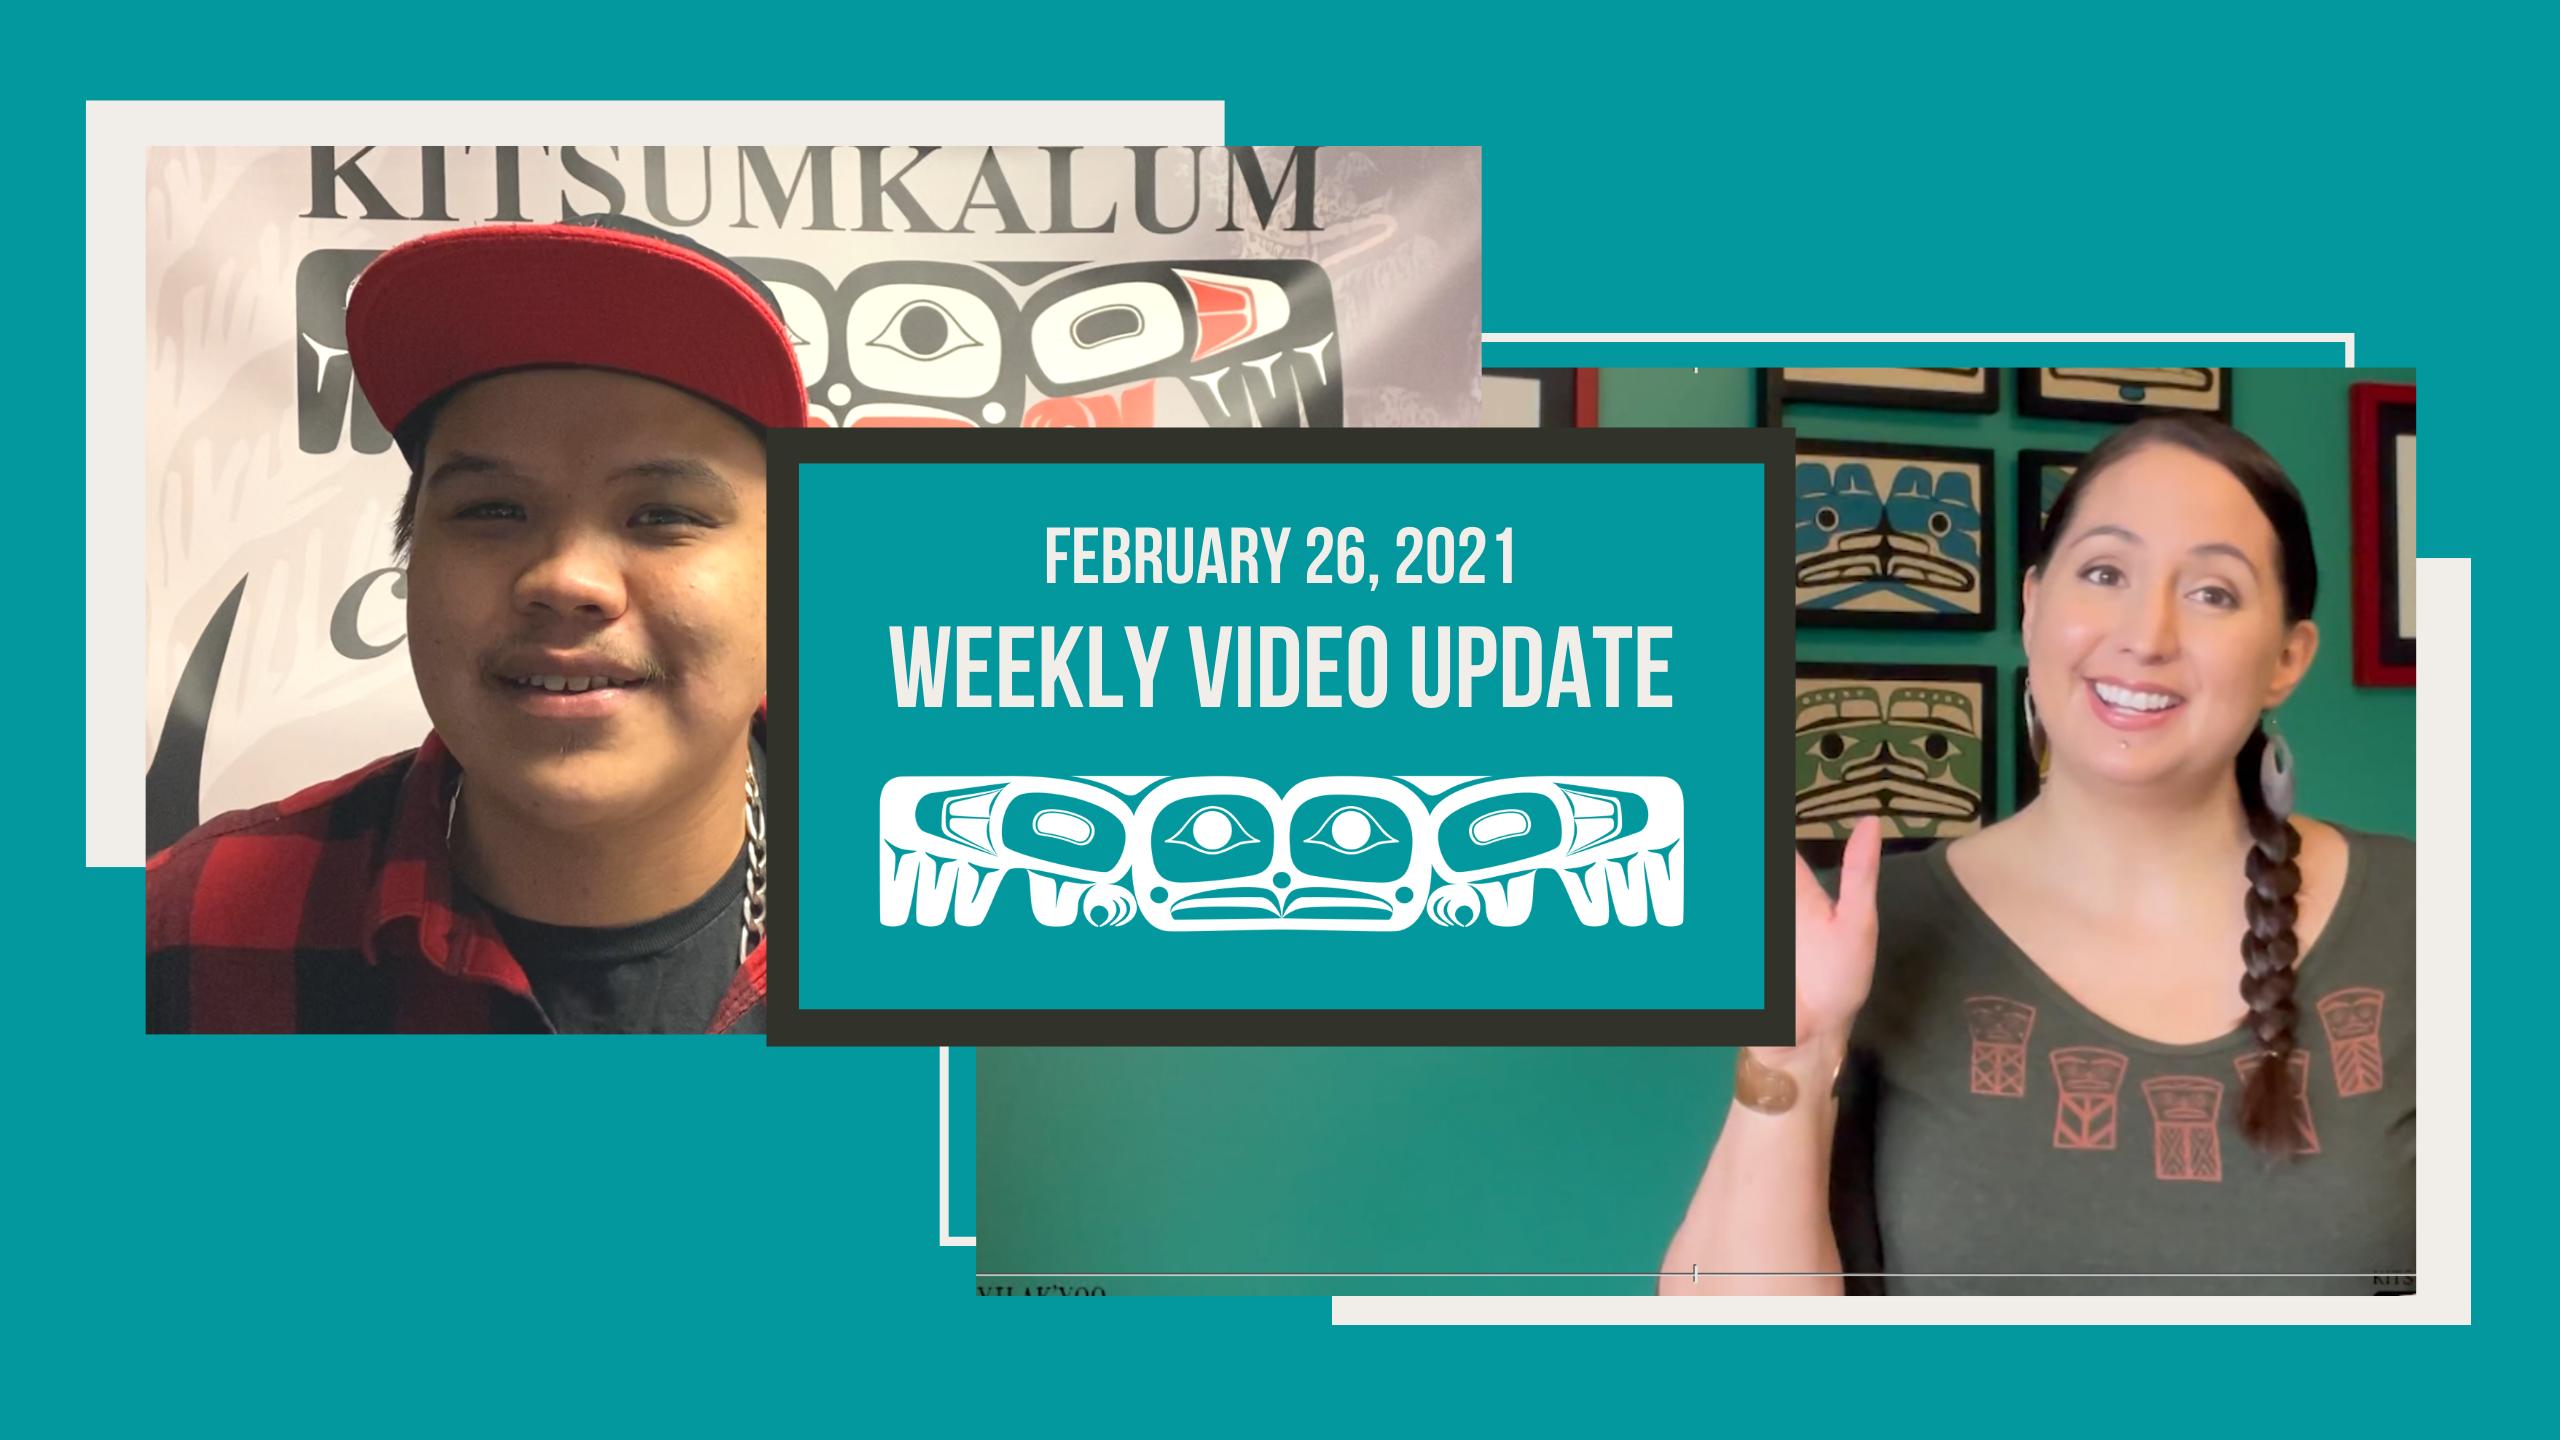 Kalum News Video Update Feb 26 2021 & Sm'algyax word of the Week!